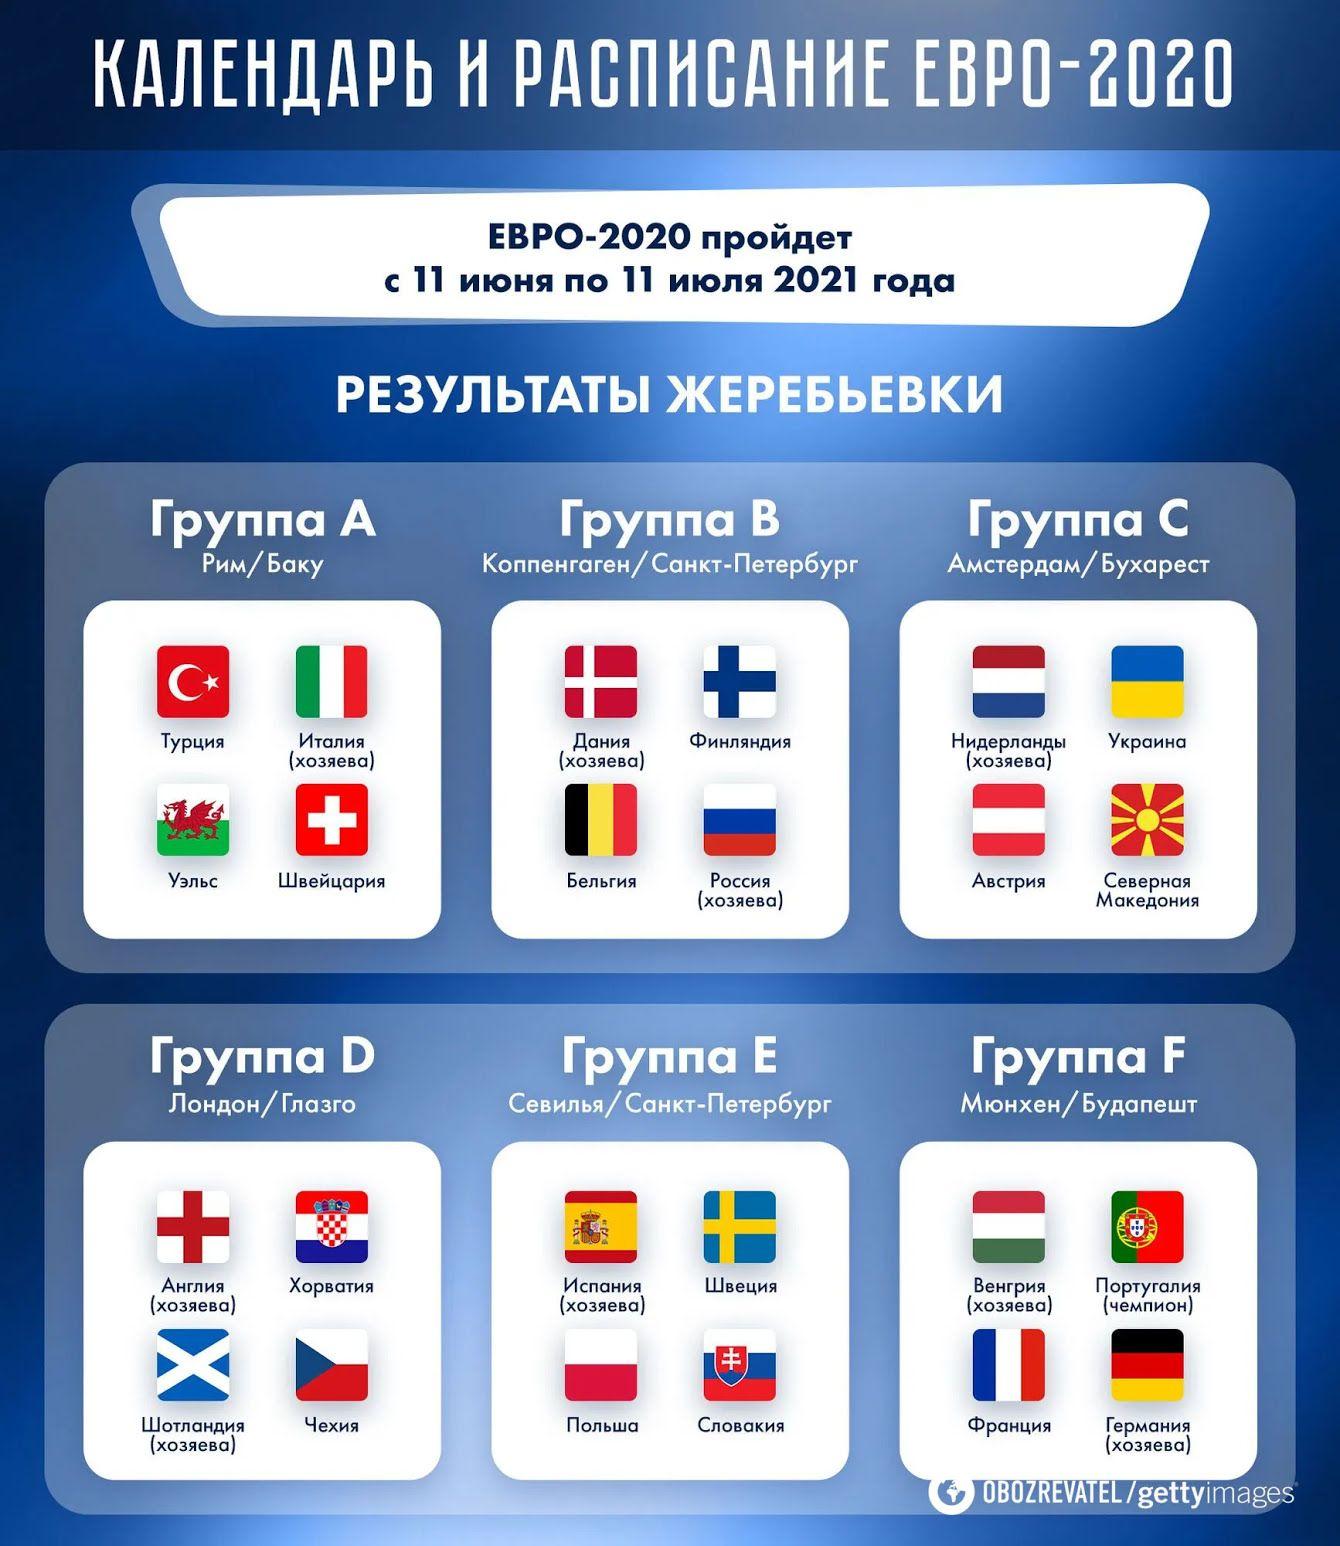 Группы Евро-2020